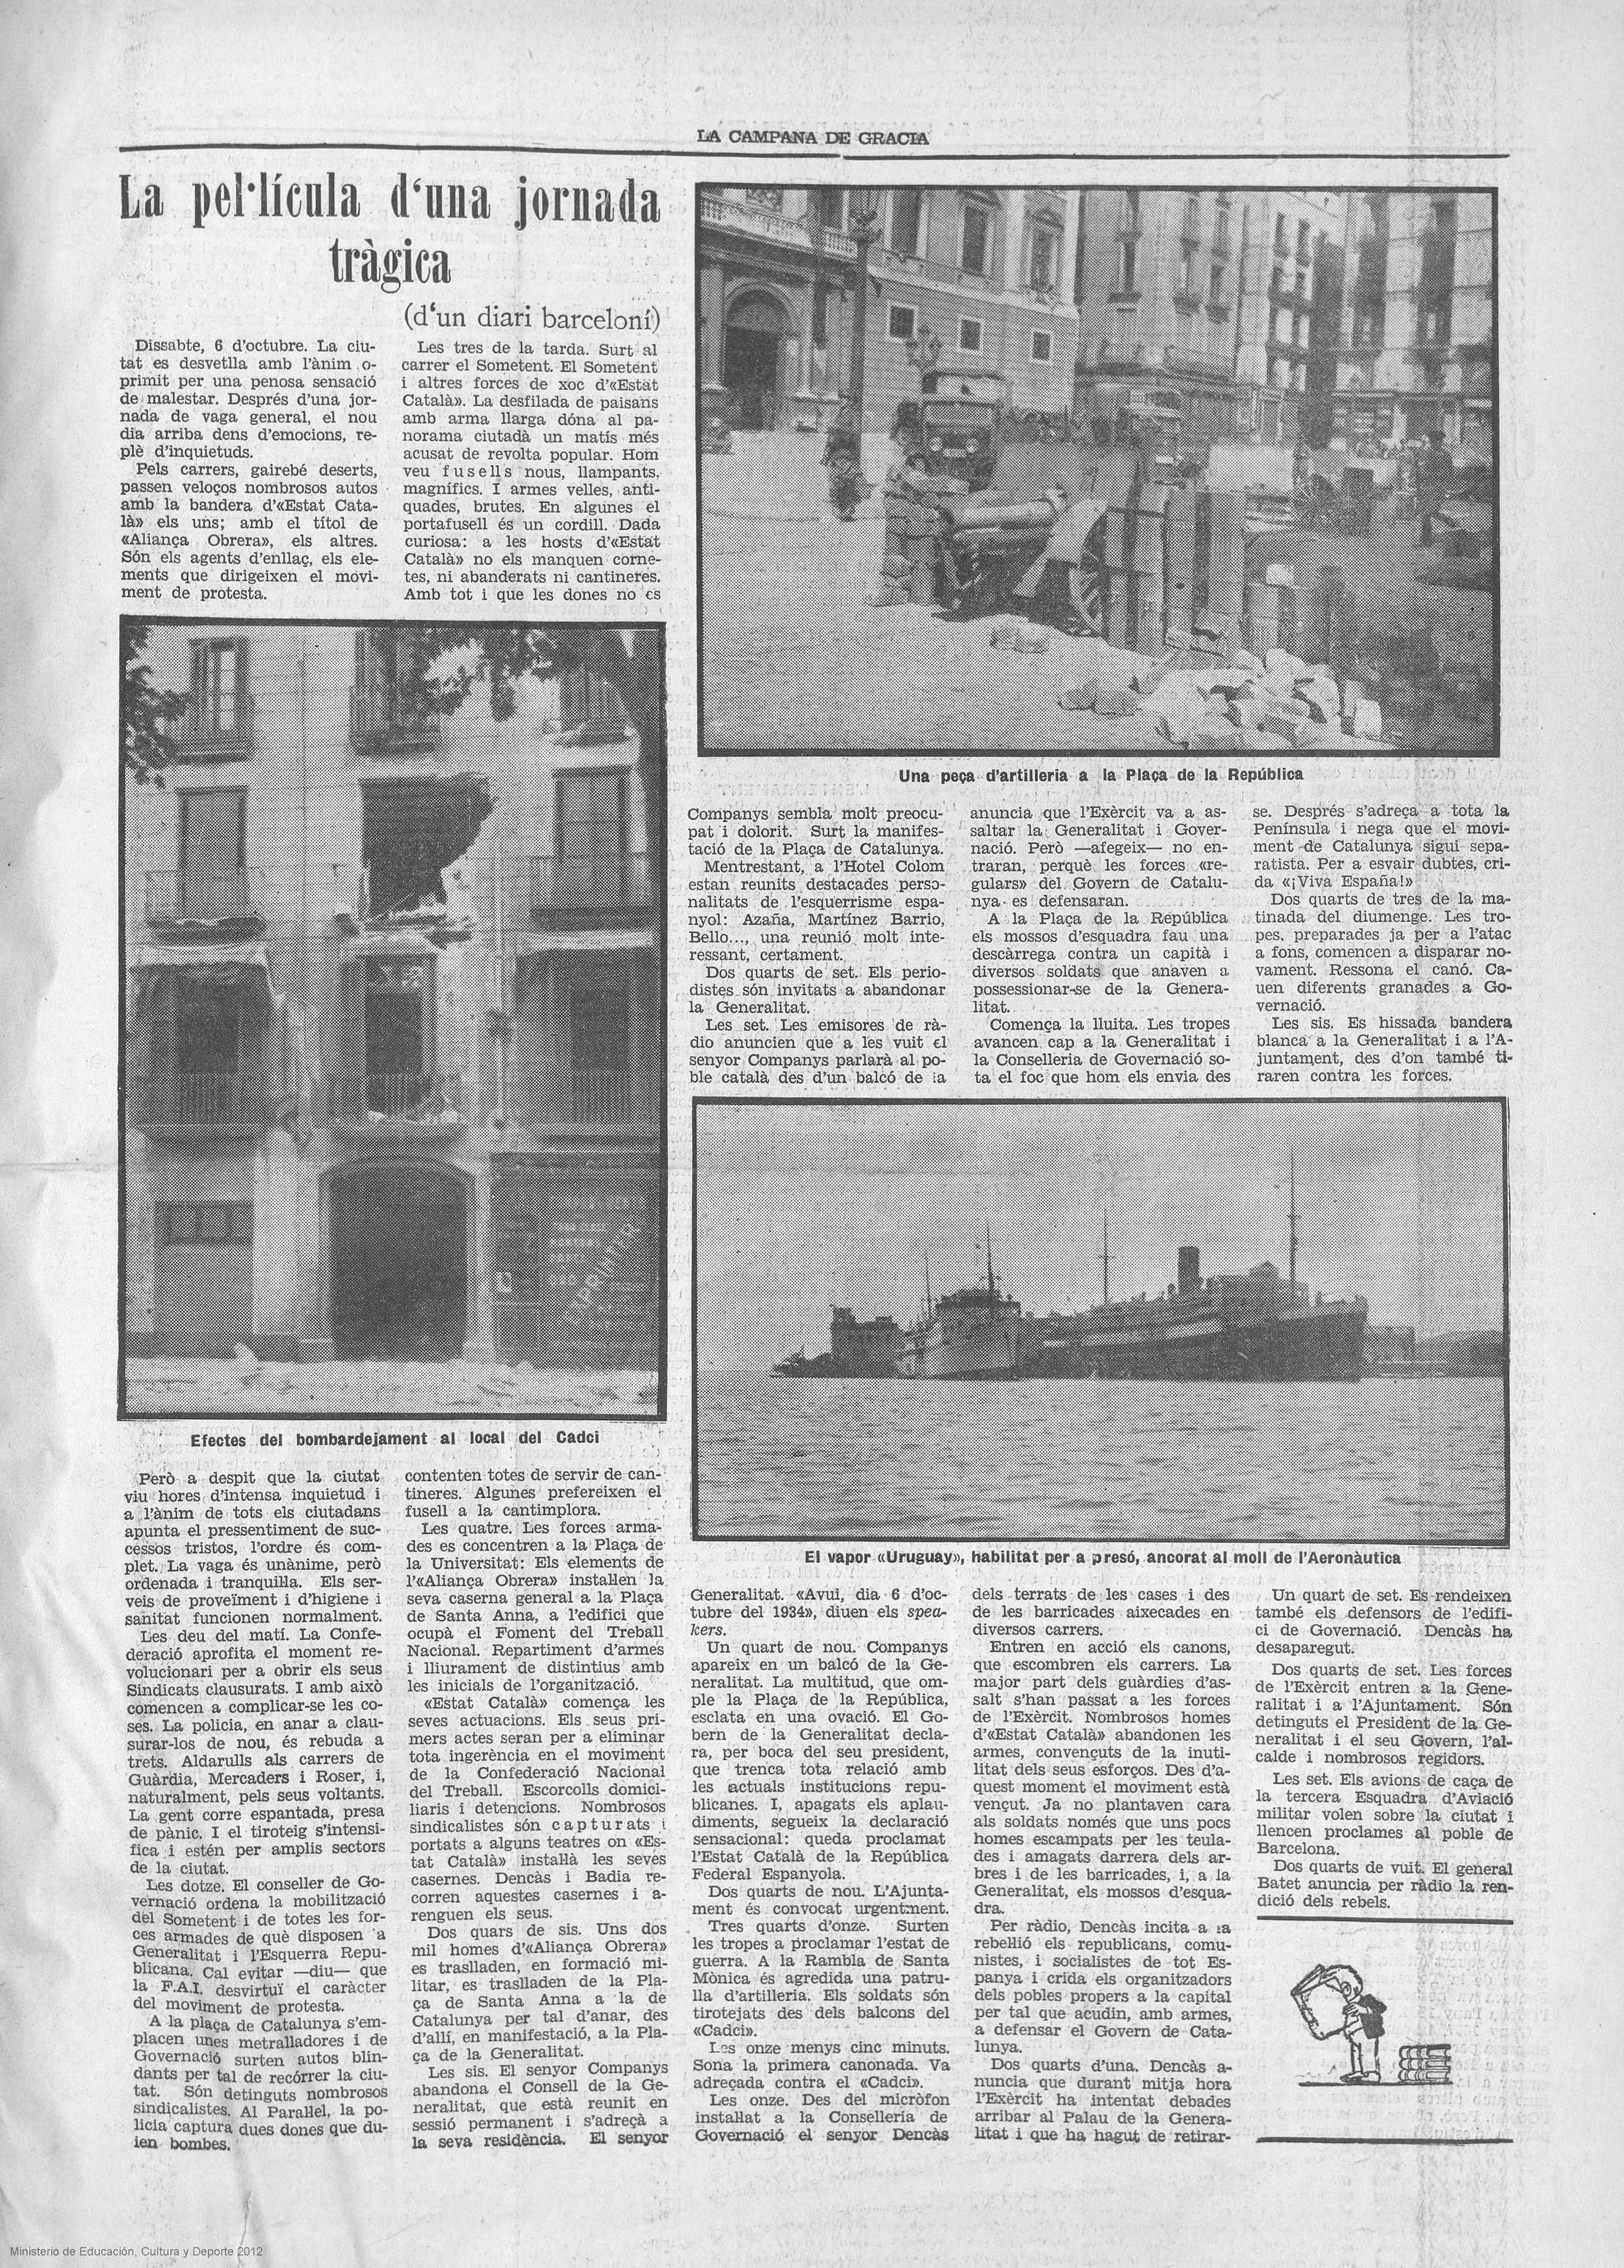 Campana de Gracia, 12 de octubre de 1934, p. 5.